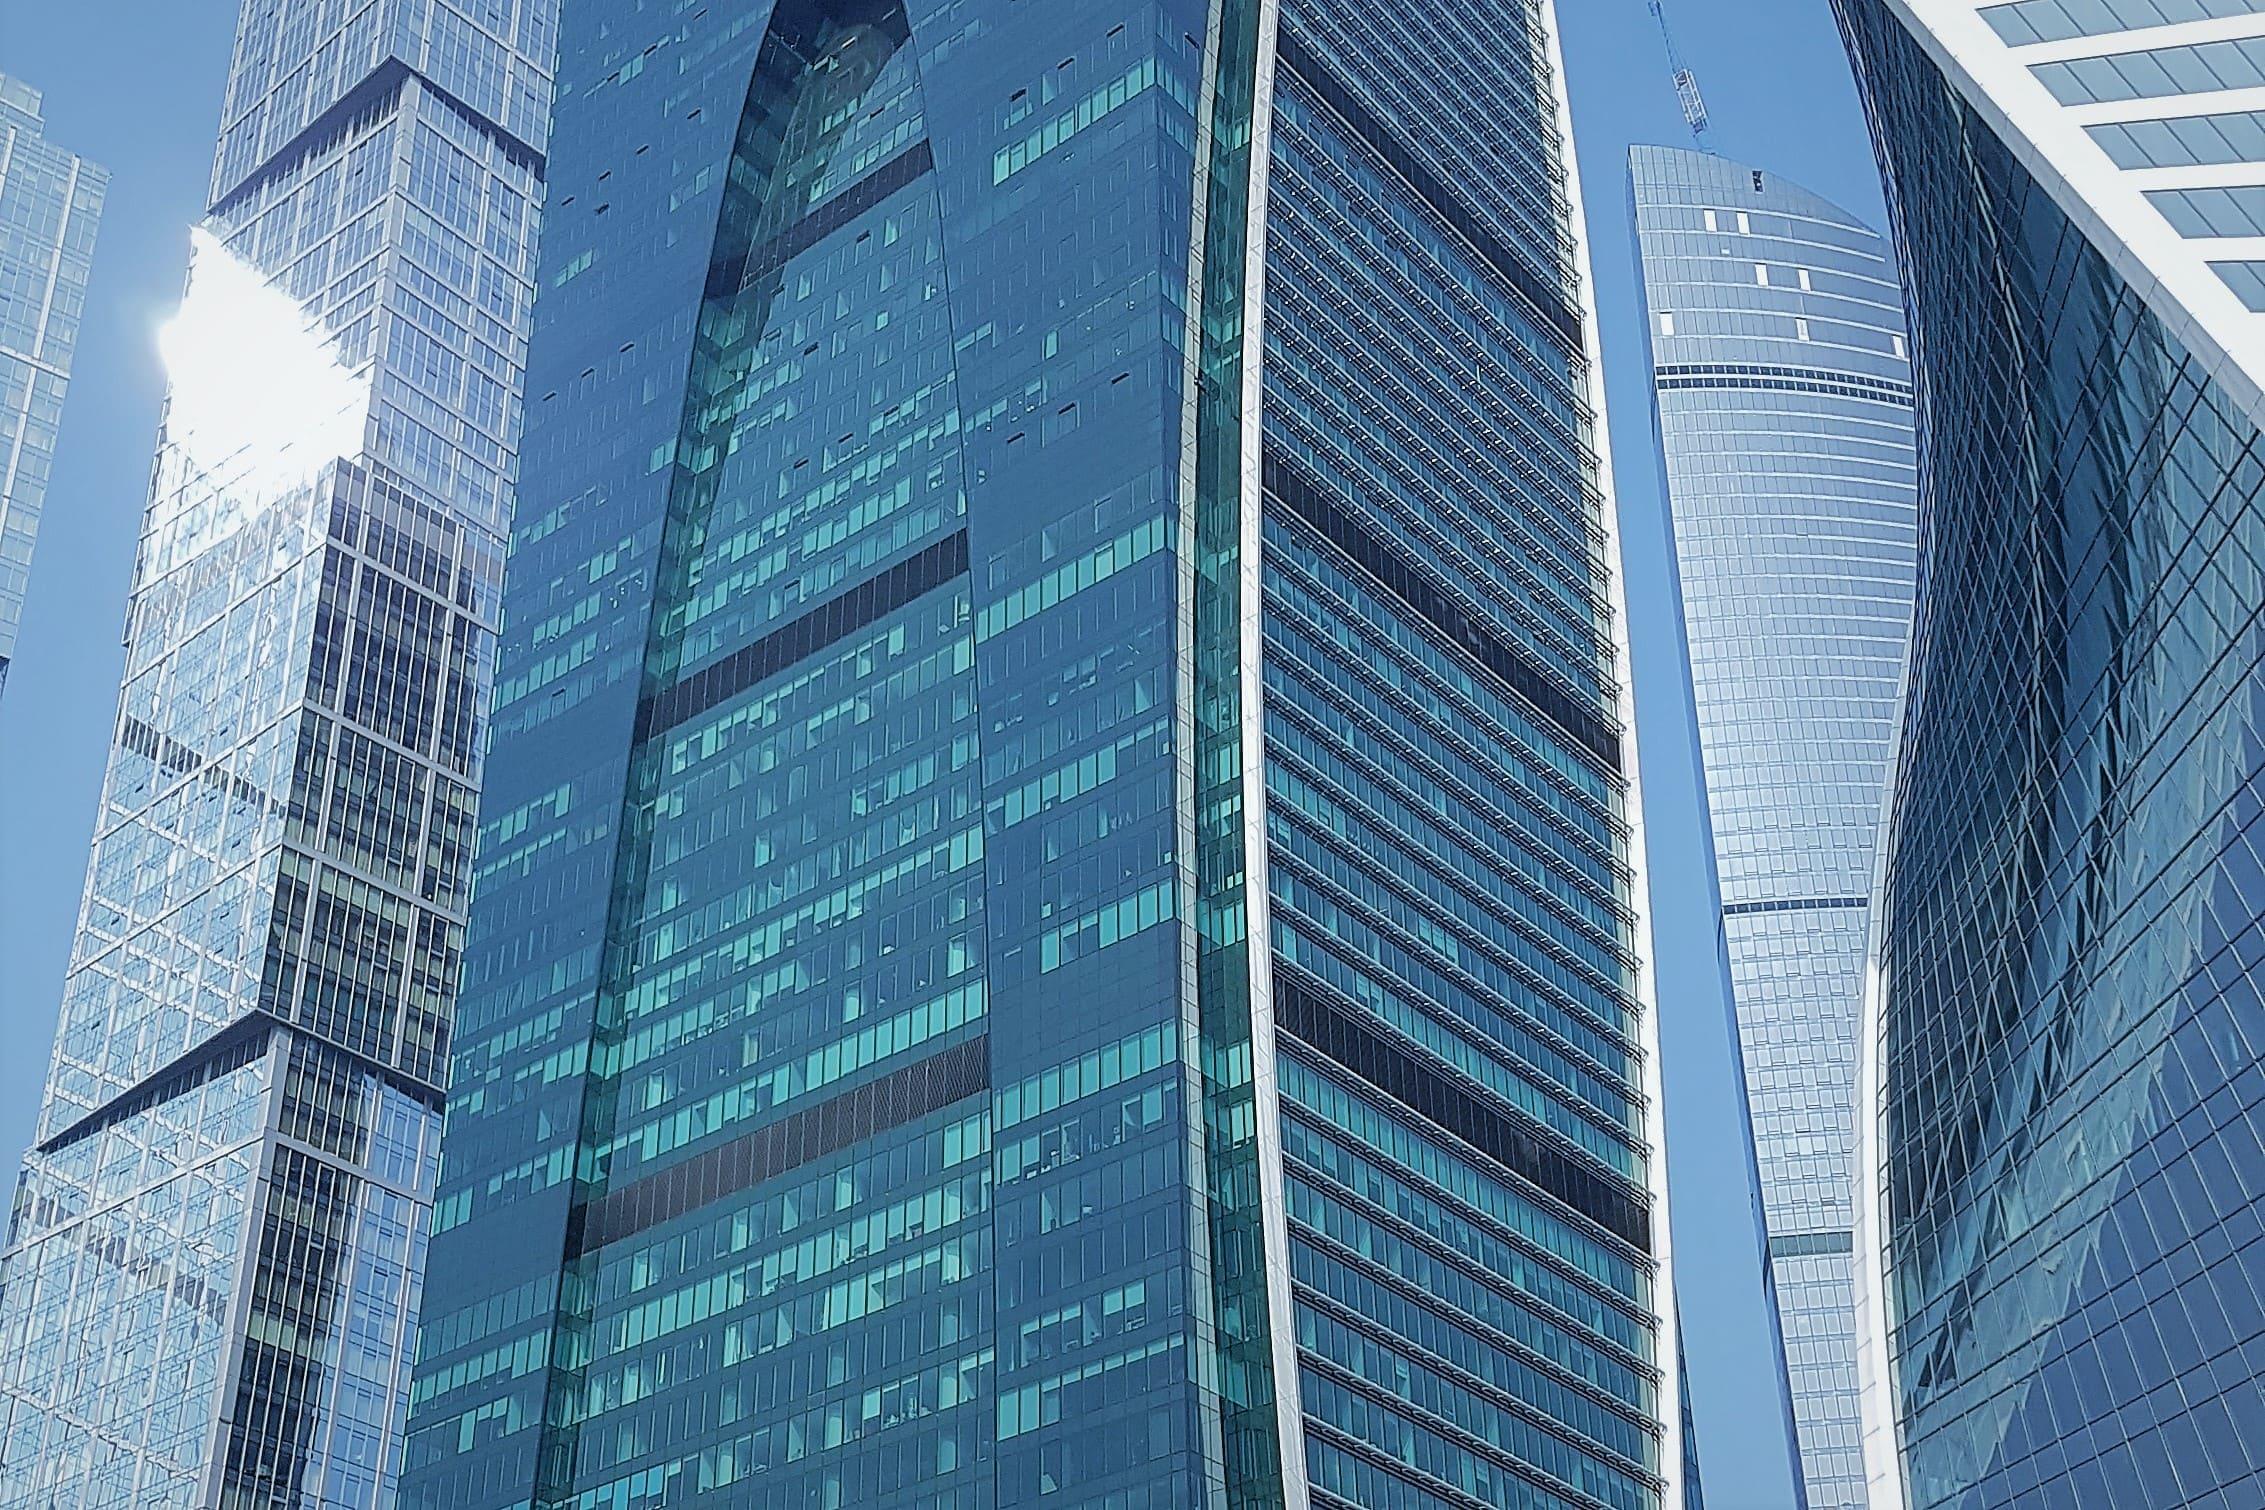 Продажа офисов БЦ Империя Москва Сити